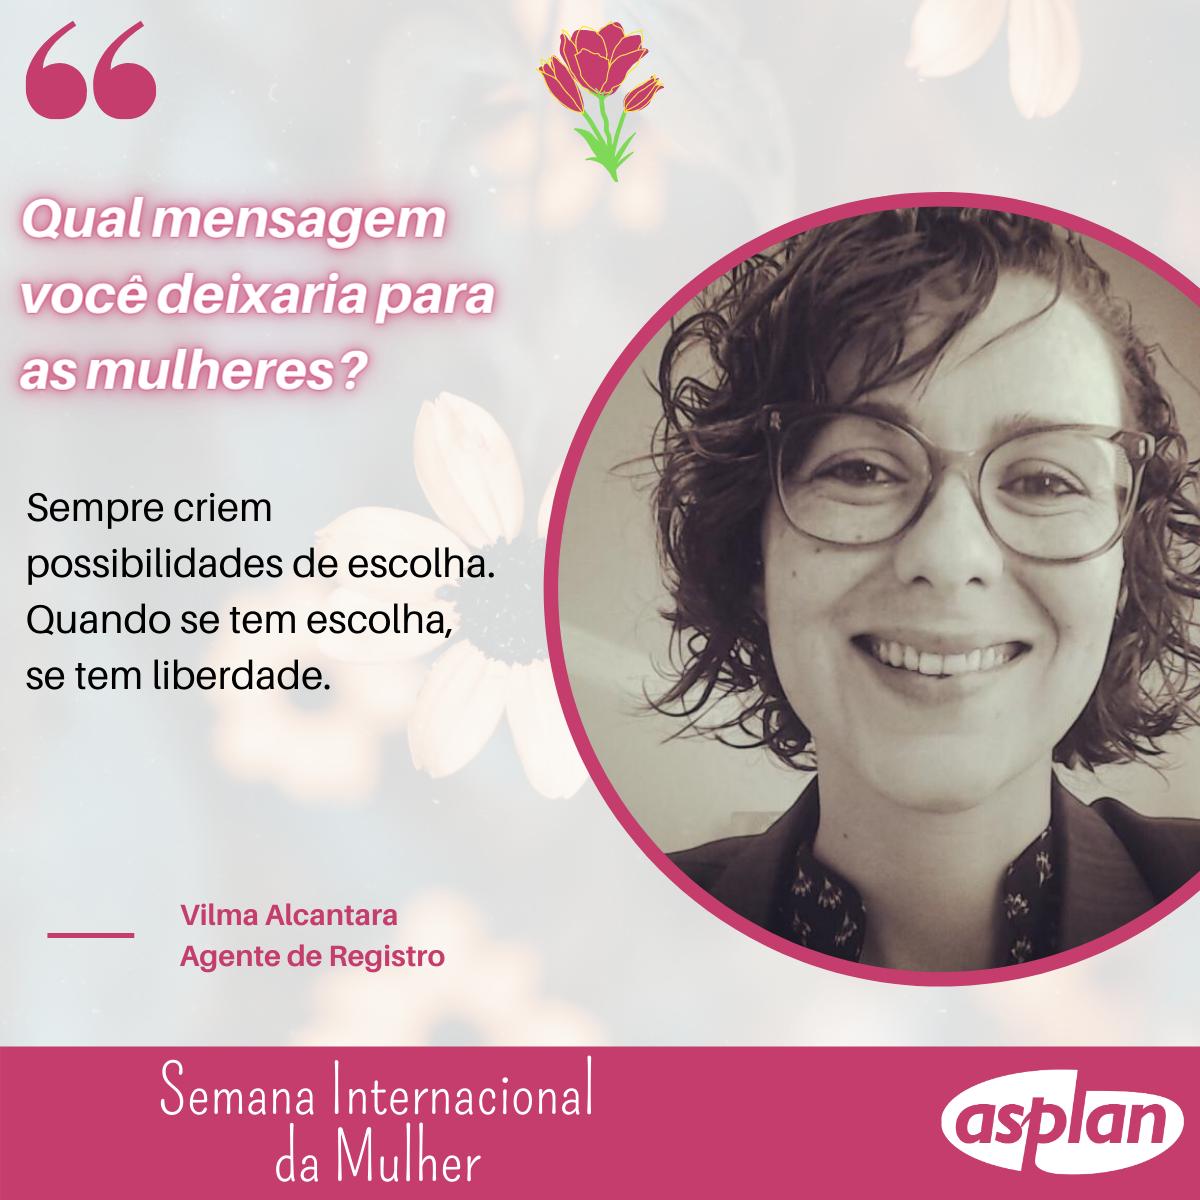 Semana Internacional Da Mulher - Vilma